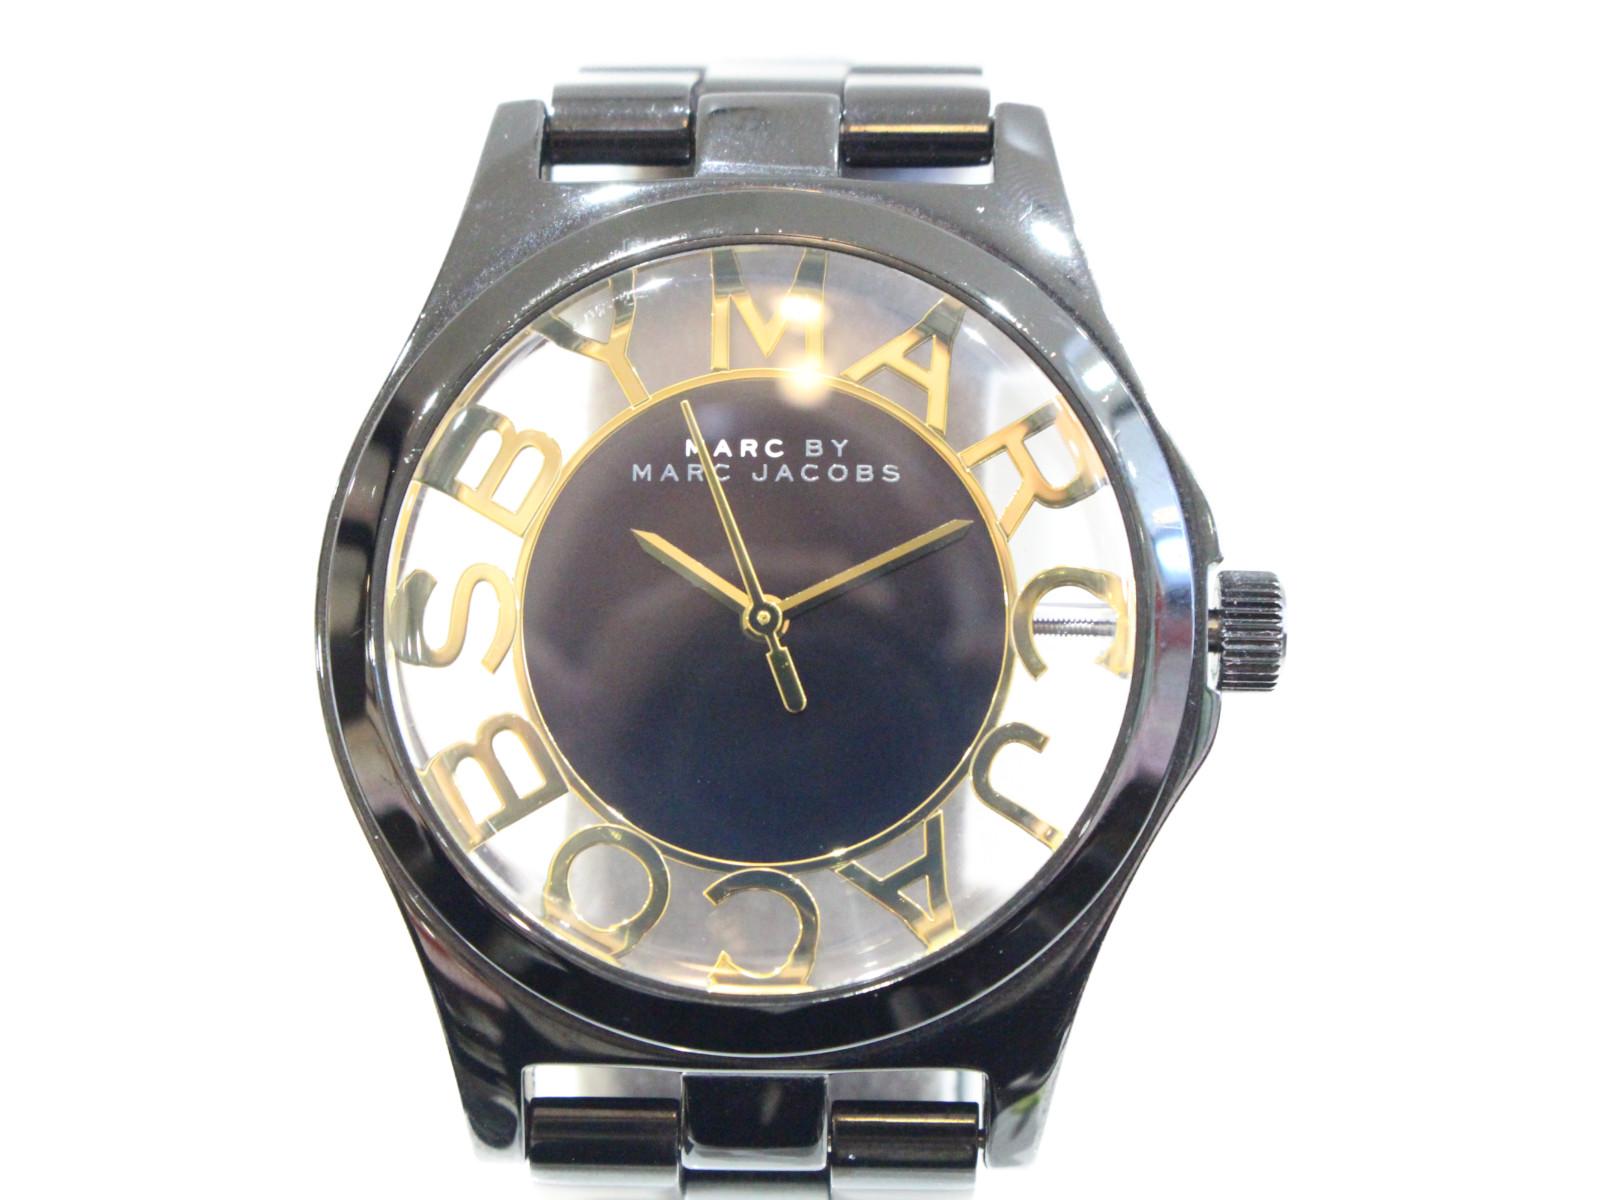 MARC BY MARC JACOBS マークバイマークジェイコブス MBM3255 ヘンリースケルトン ブラック クオーツ 腕時計【中古】